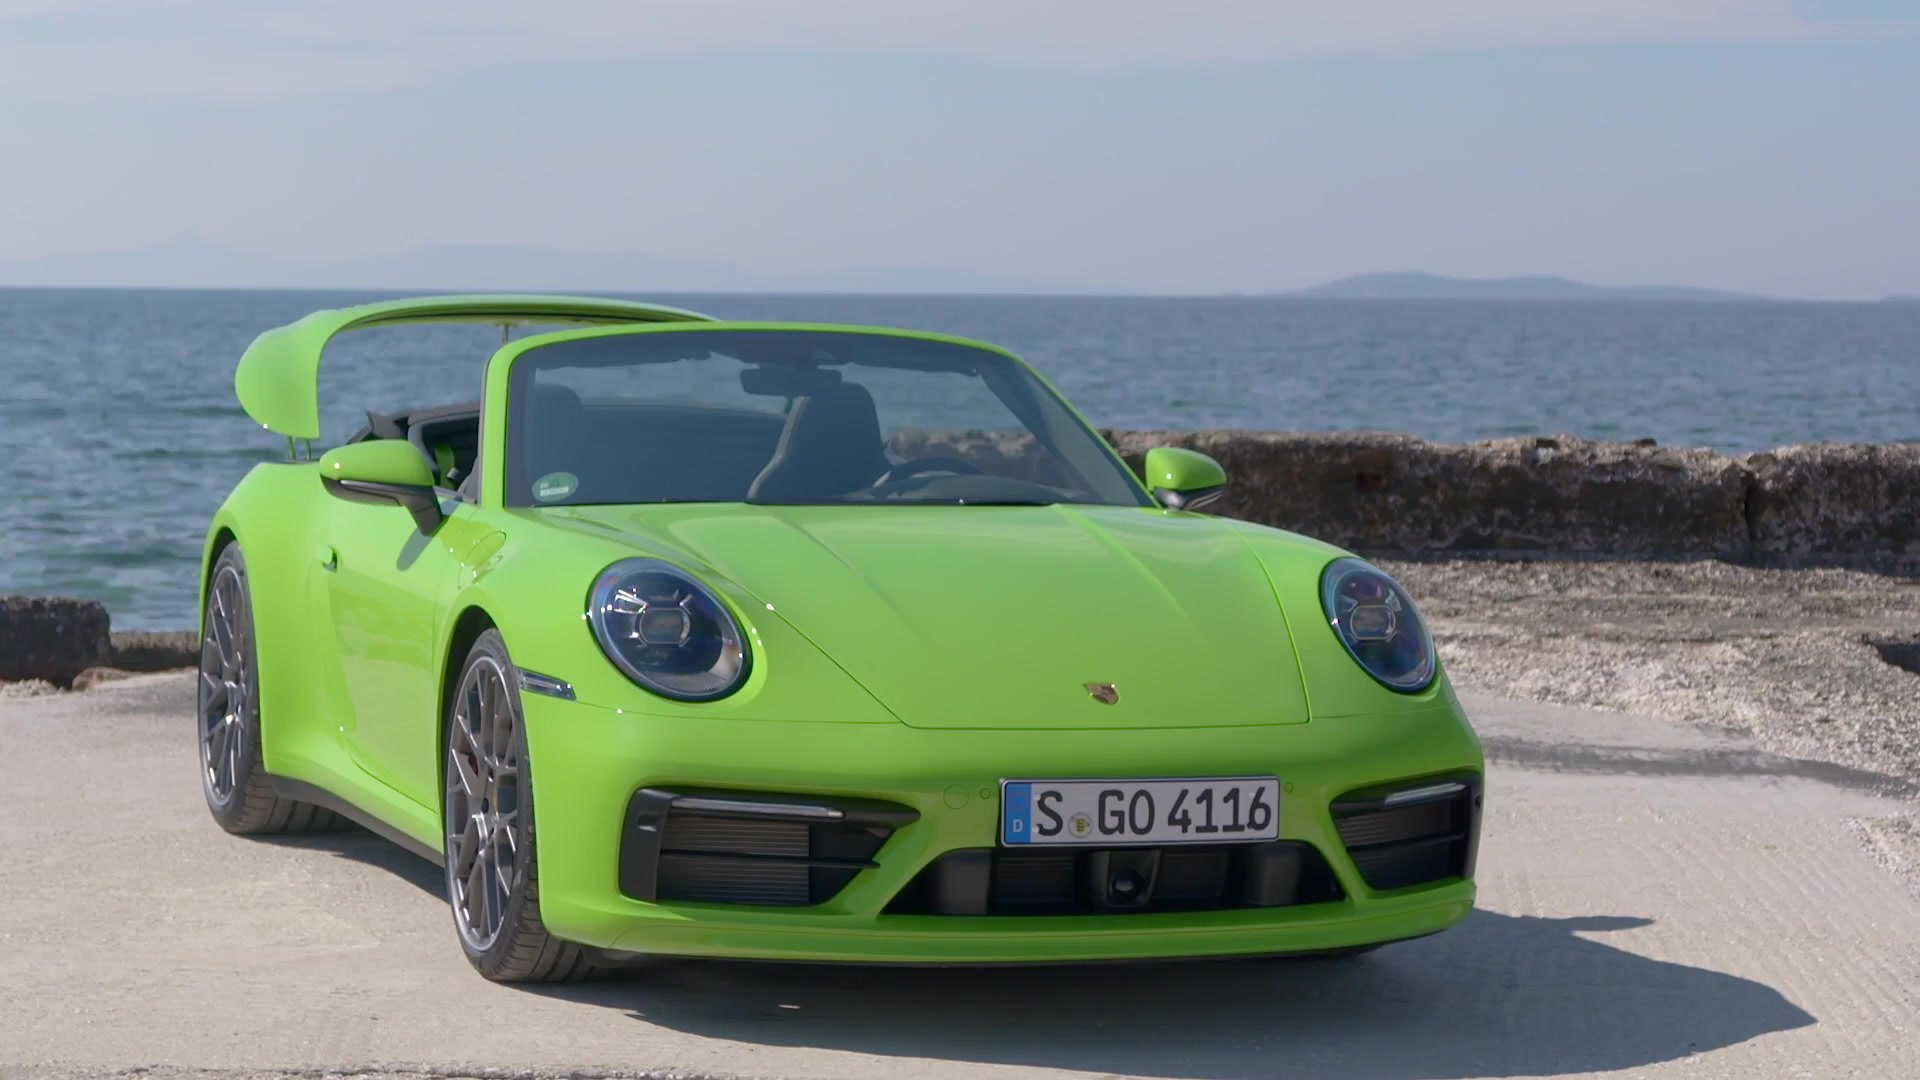 Porsche 911 Carrera 4s Cabriolet Design In Lizard Green Video Dailymotion